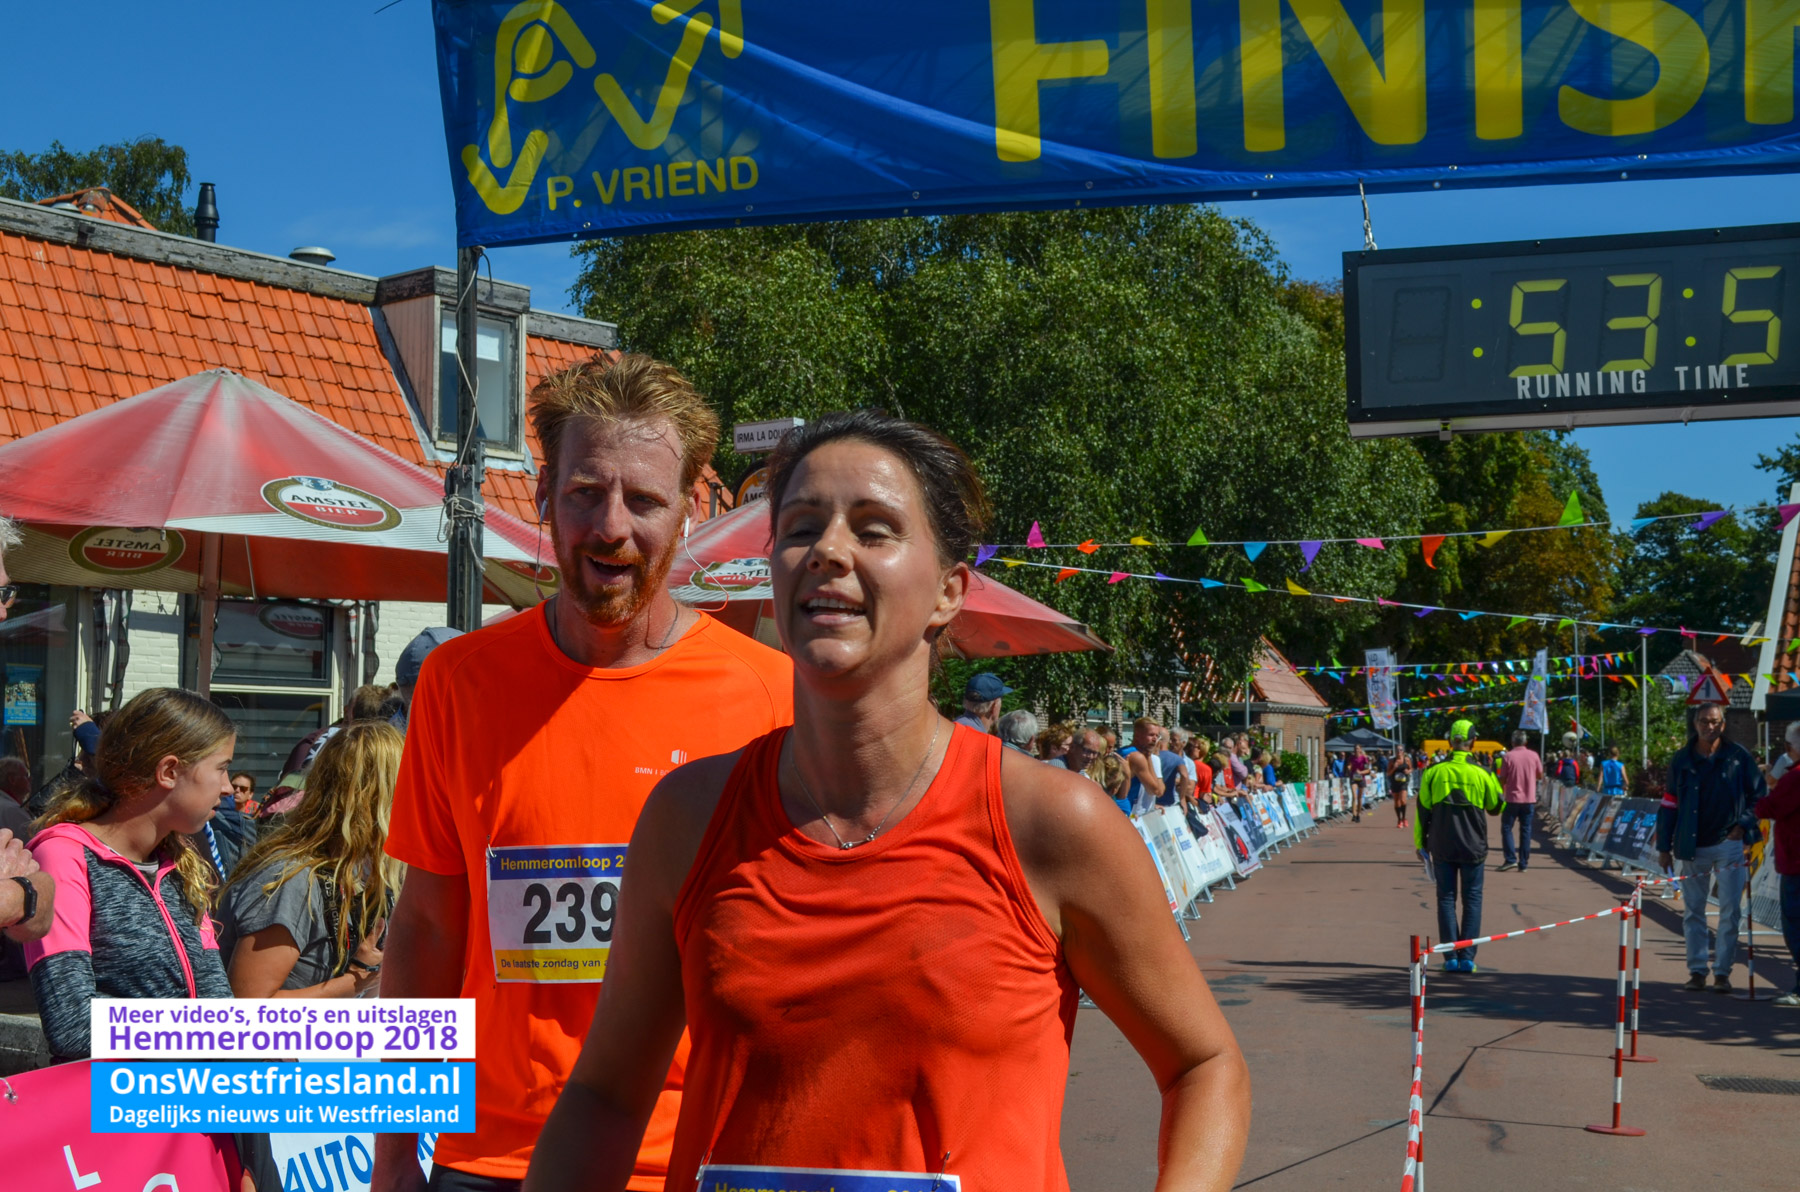 Foto's Hemmeromloop 2018 – Finish 10km